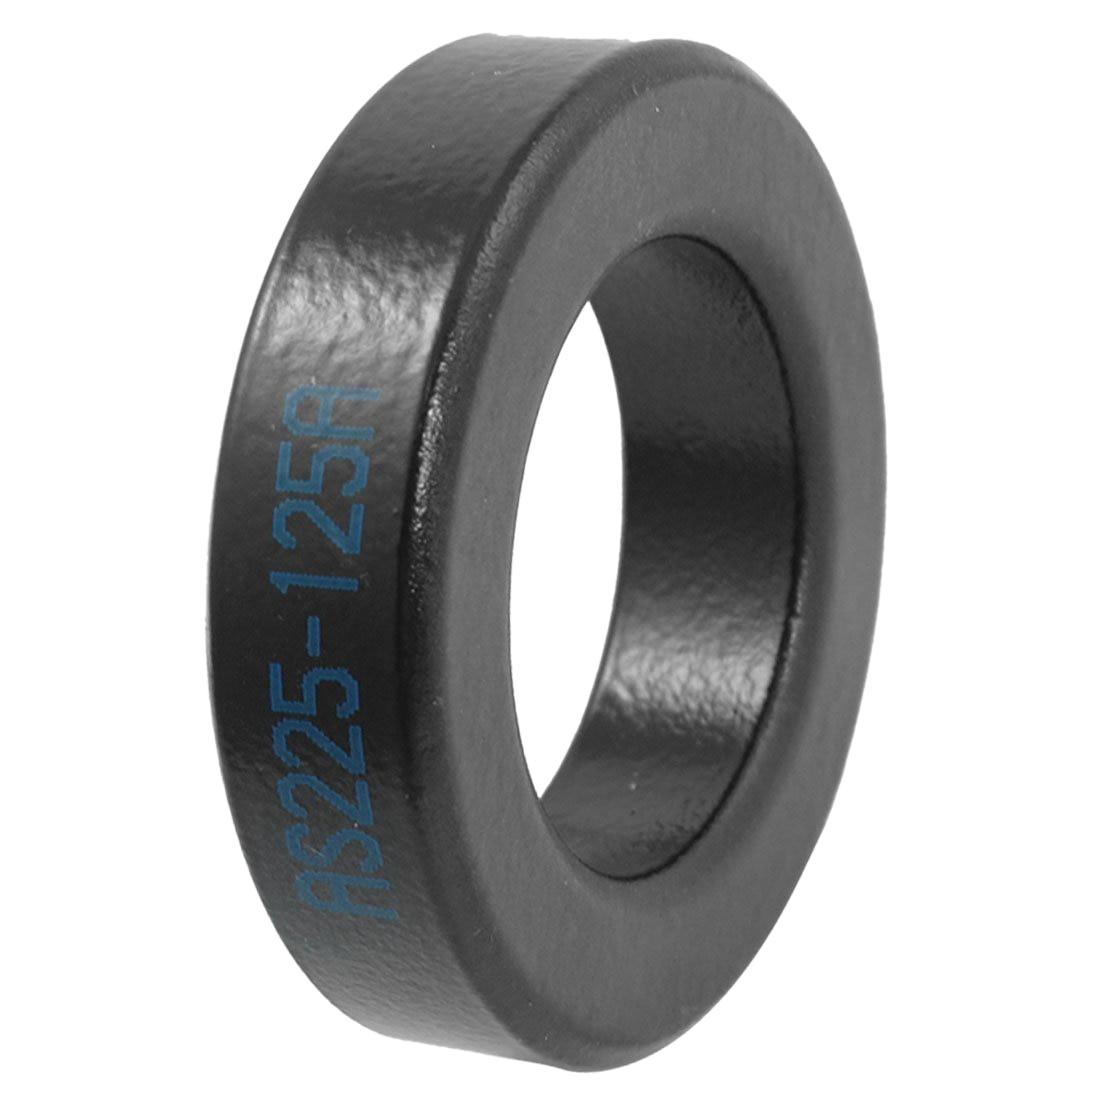 AS225-125A ferrite rings, toroidal cores in black iron for electrical inductors toroidal transformer 32mm inner diameter ferrite core as200 125a black